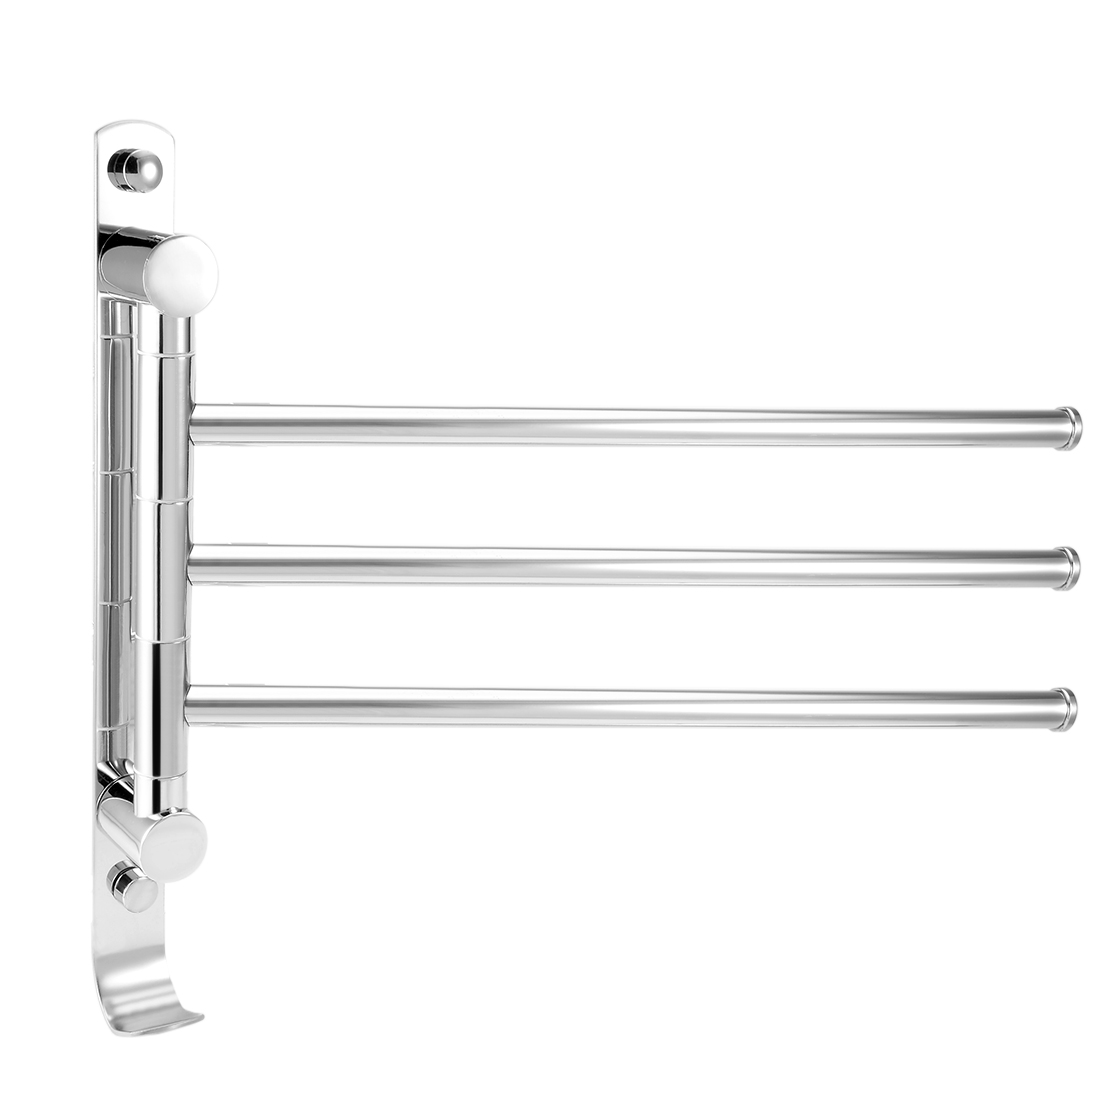 201 Stainless Steel 3 Bar Folding Arm Swivel Hanger Towel Rail Polished w Hook